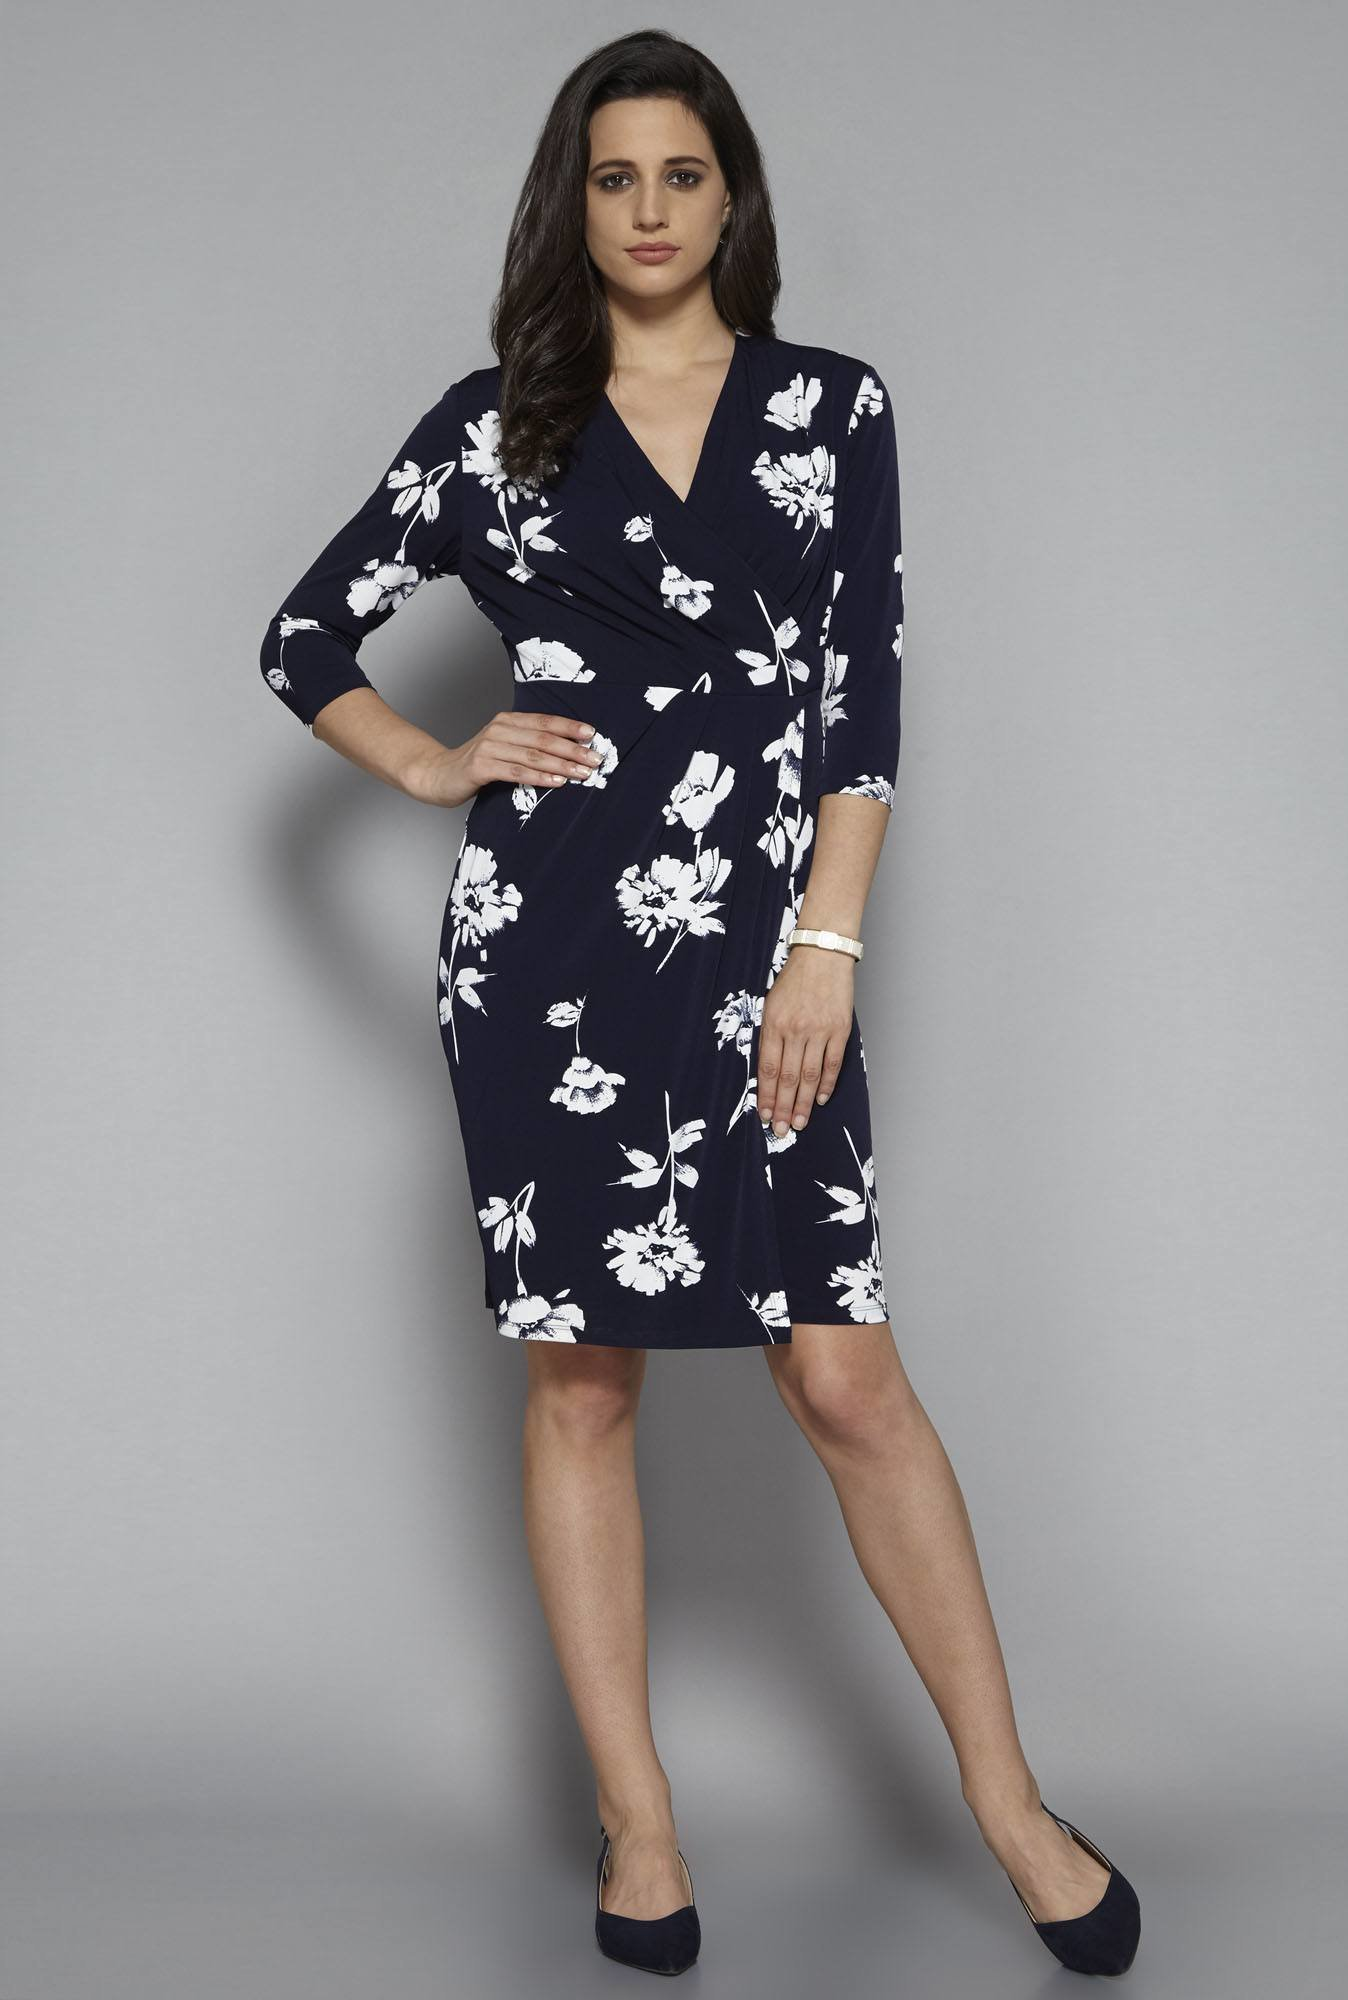 Wardrobe by Westside Navy Ollie Dress